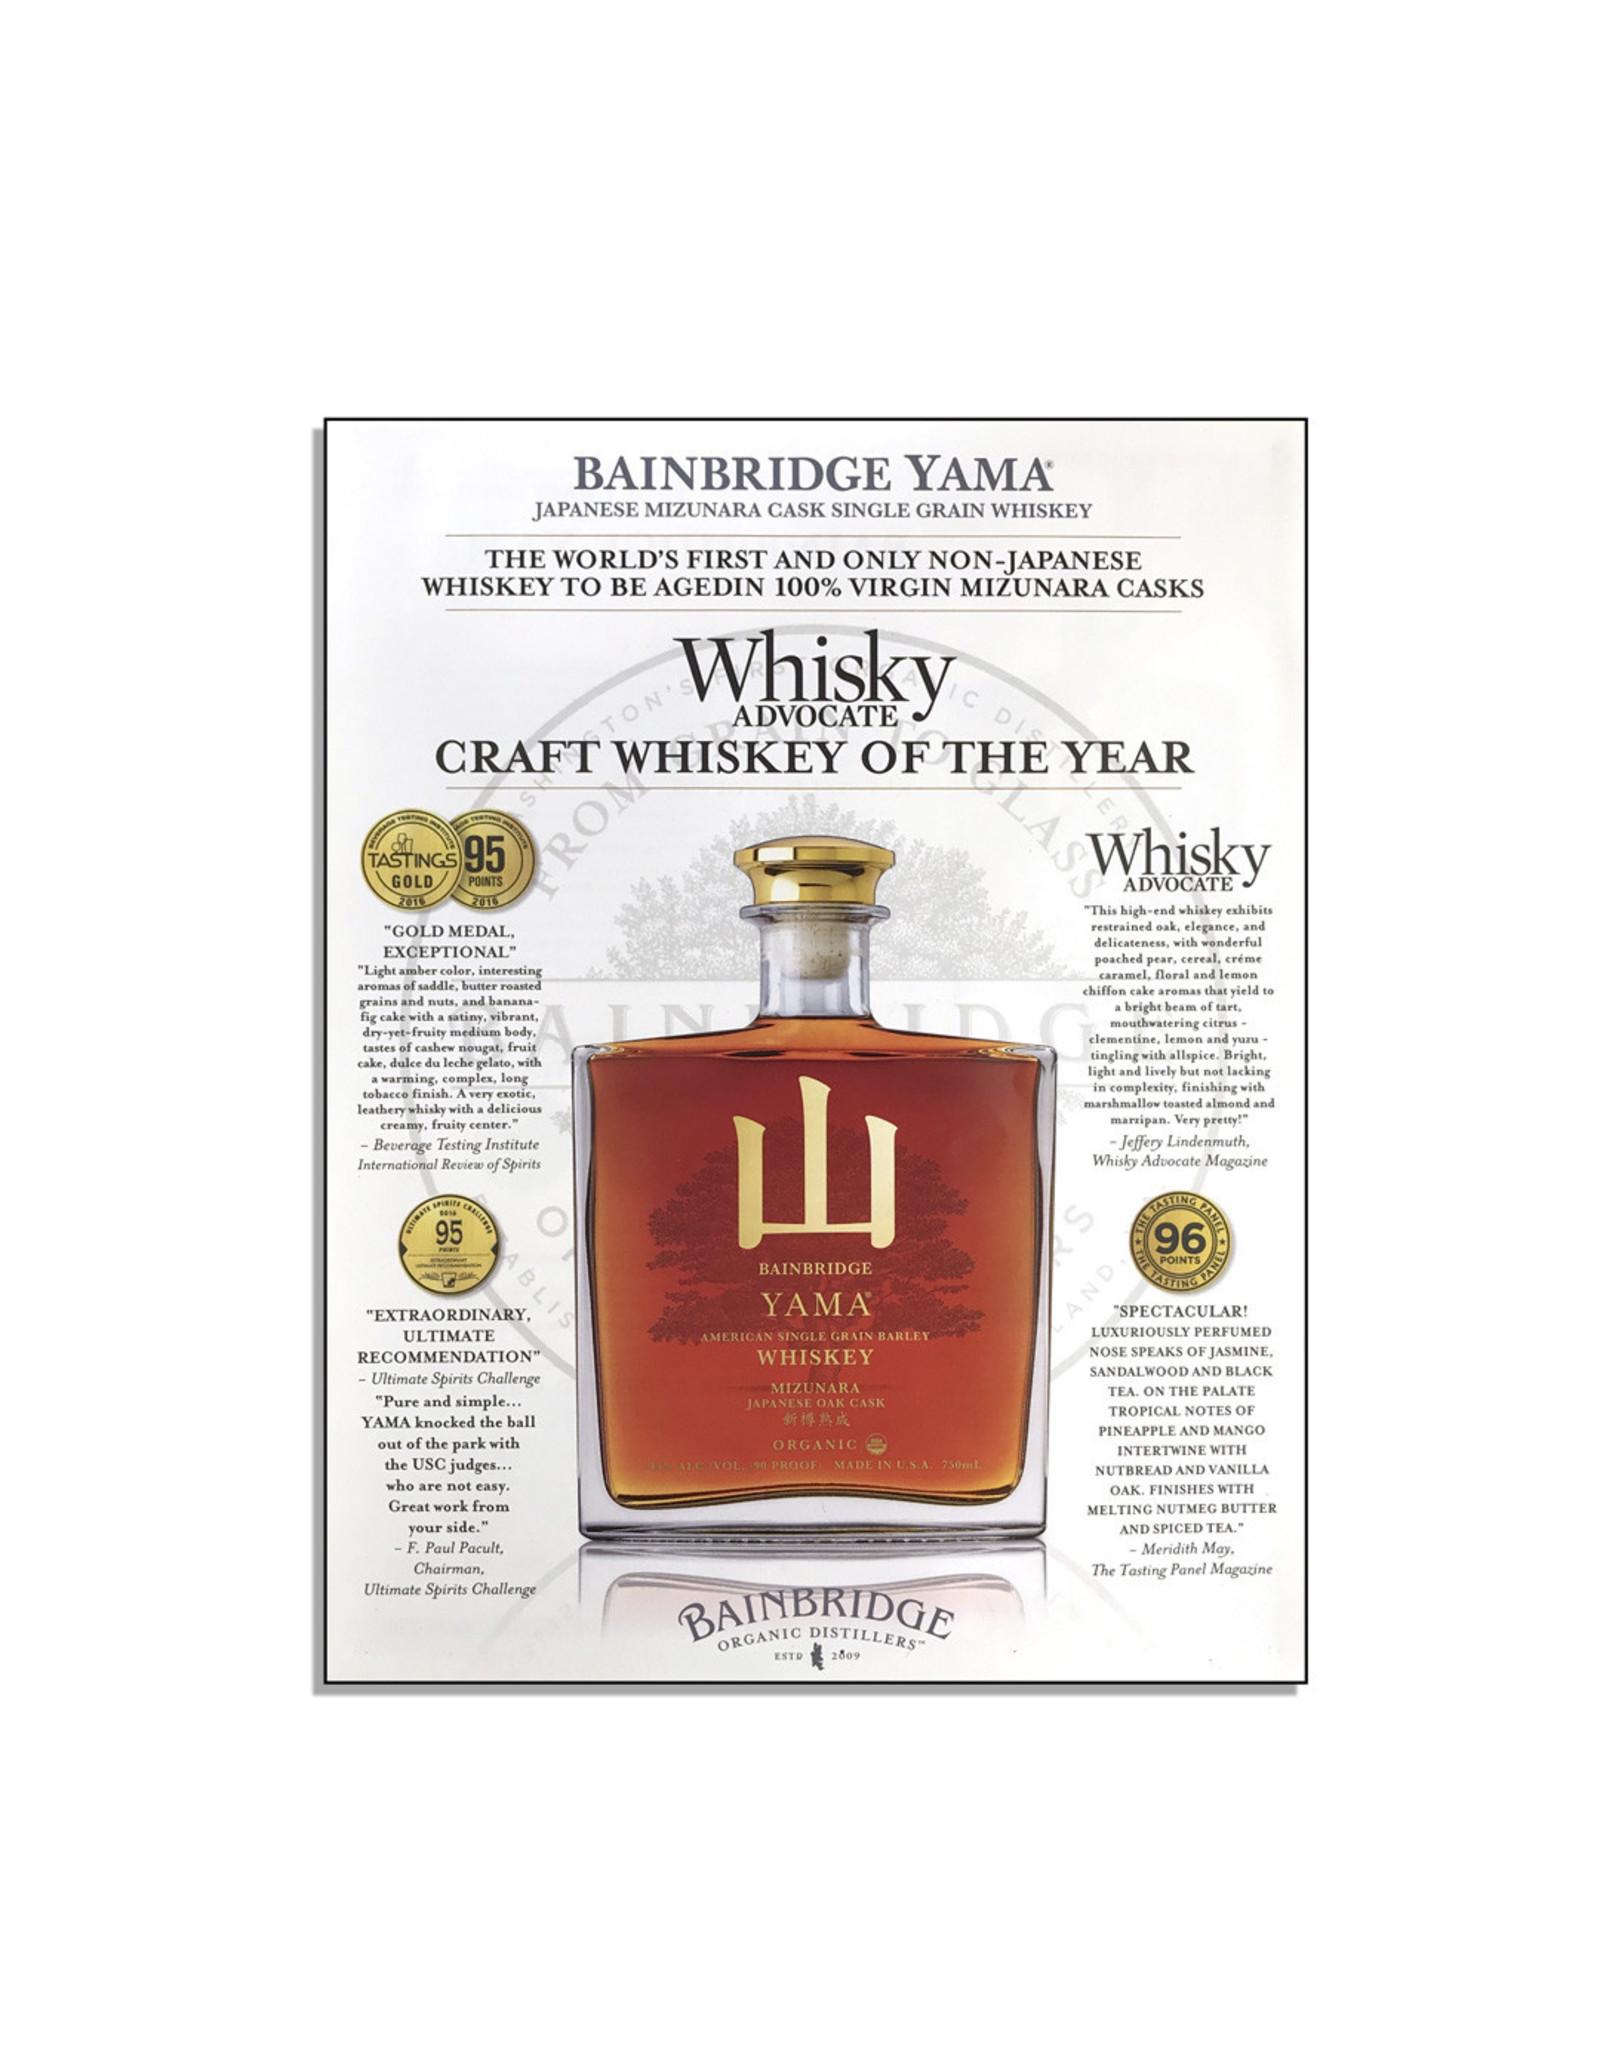 Bainbridge Yama Organic Whiskey